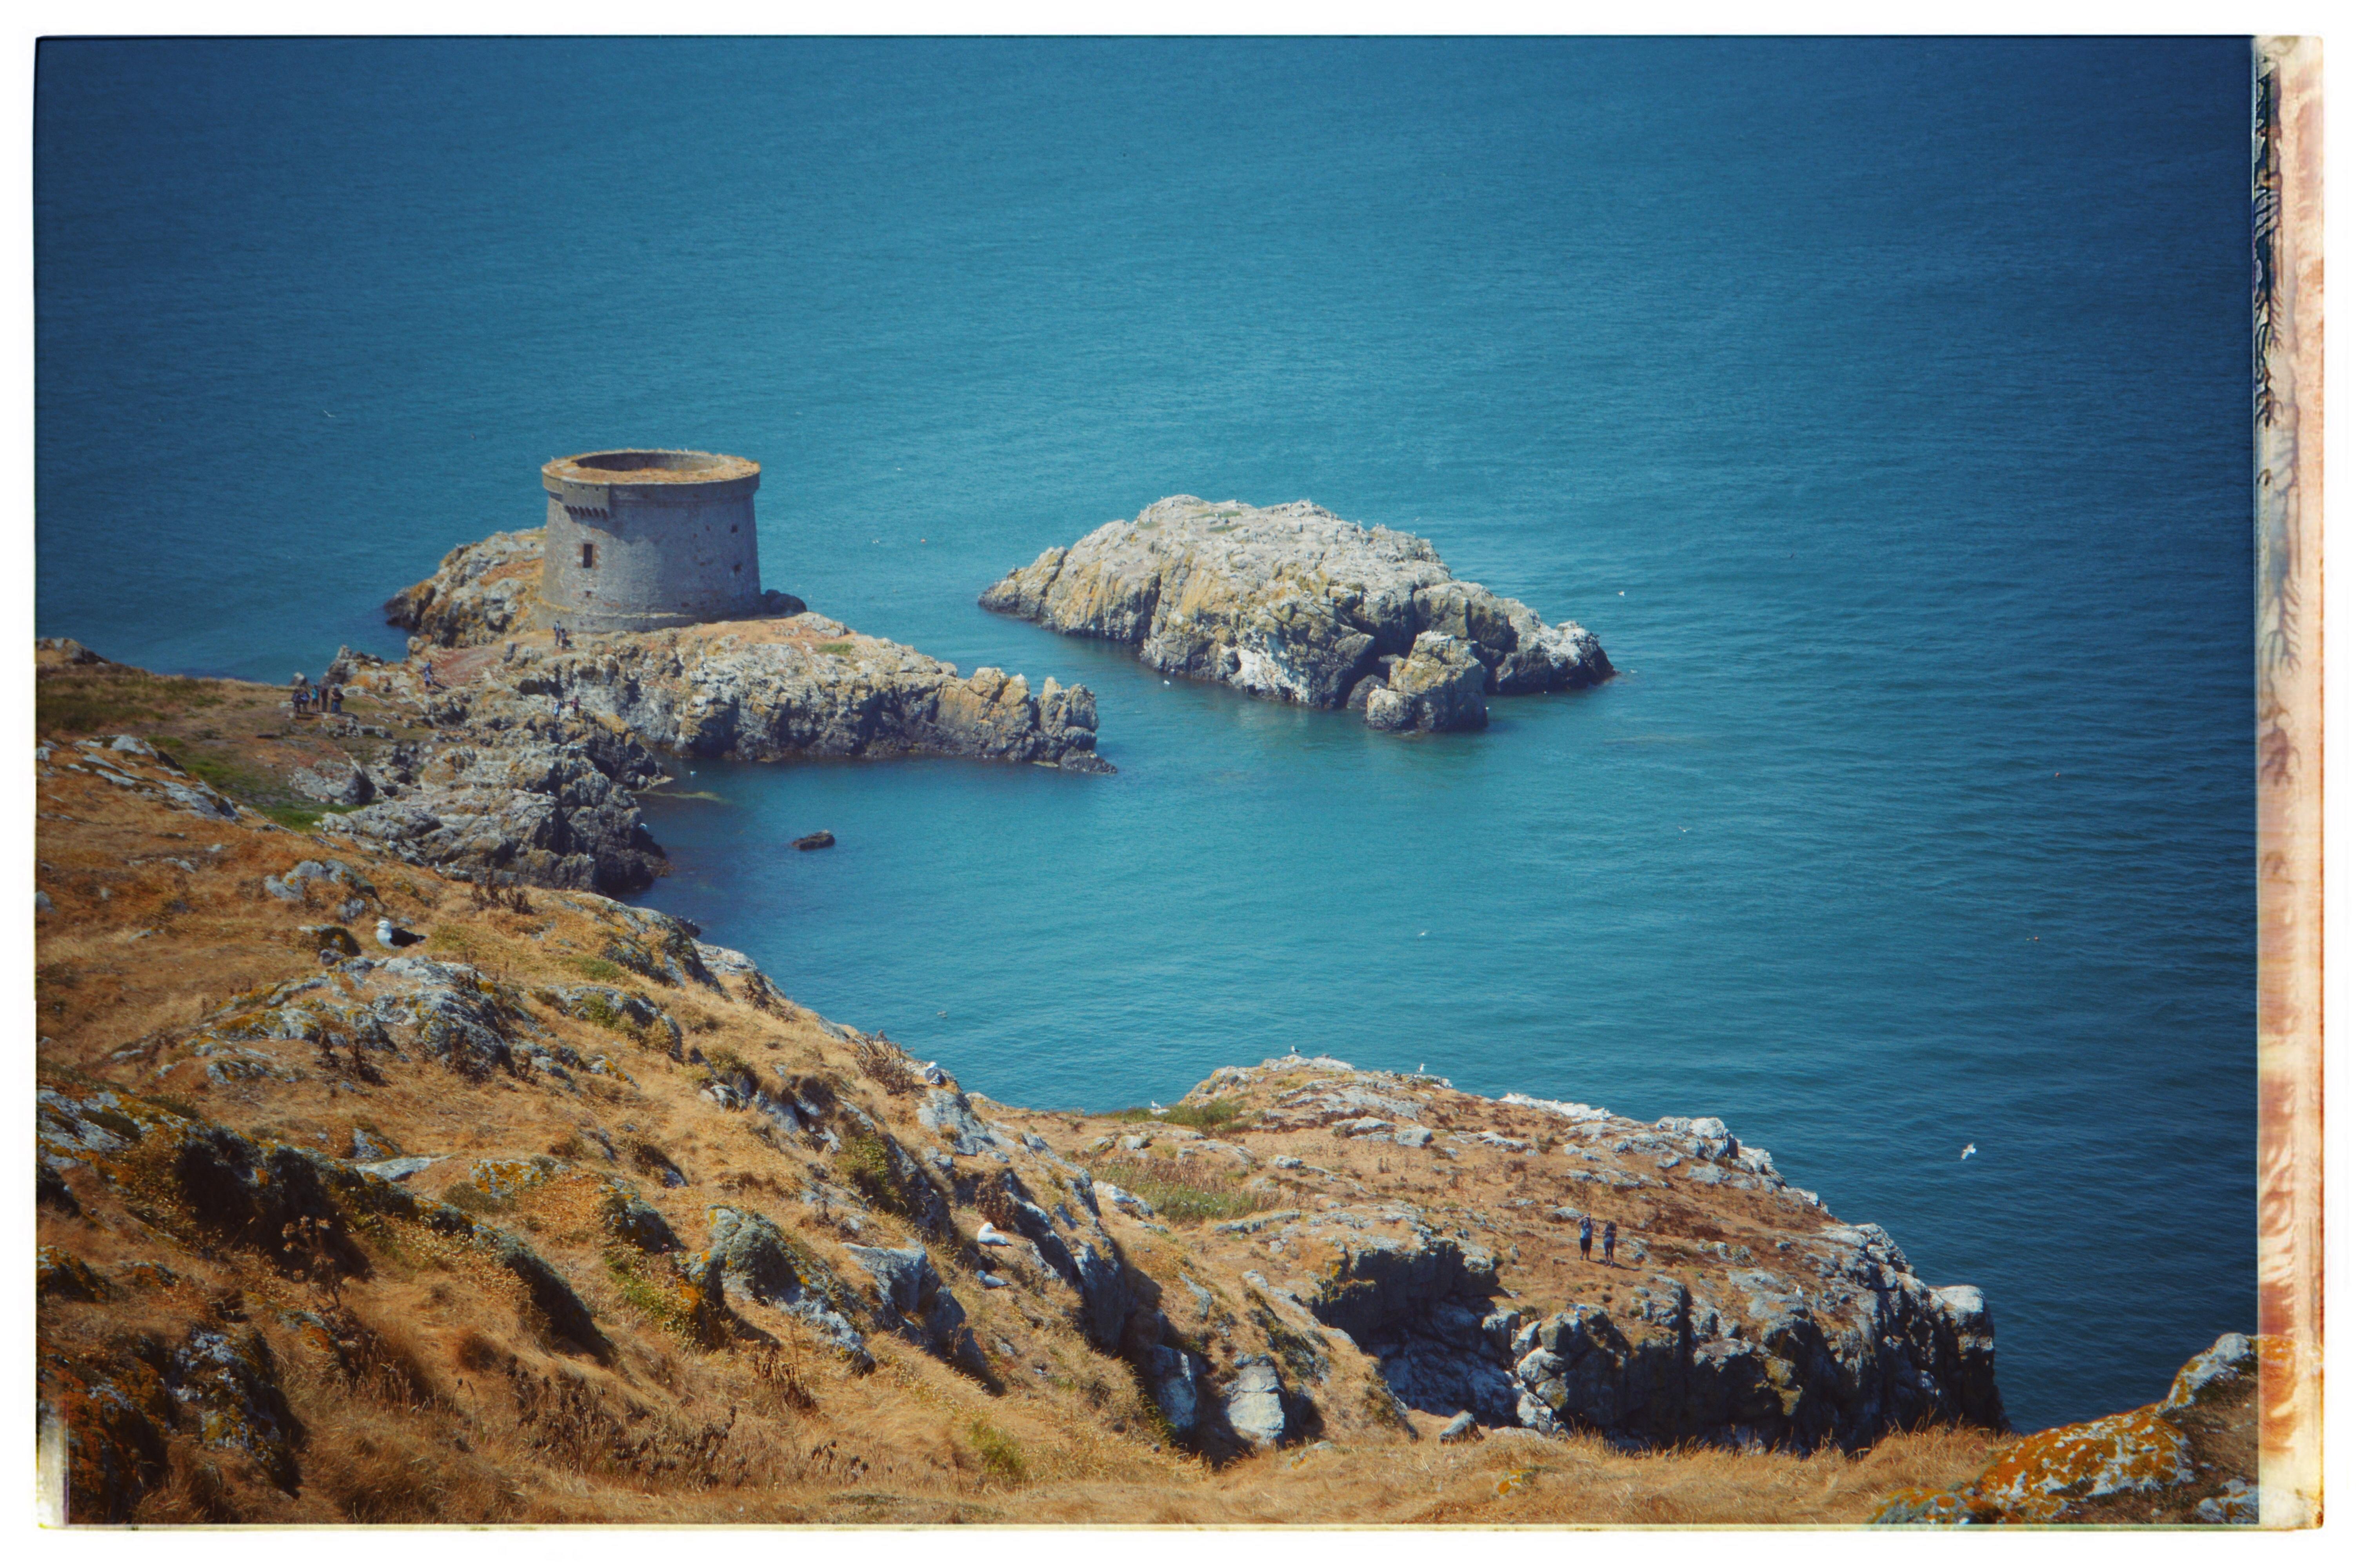 Howth island in Ireland